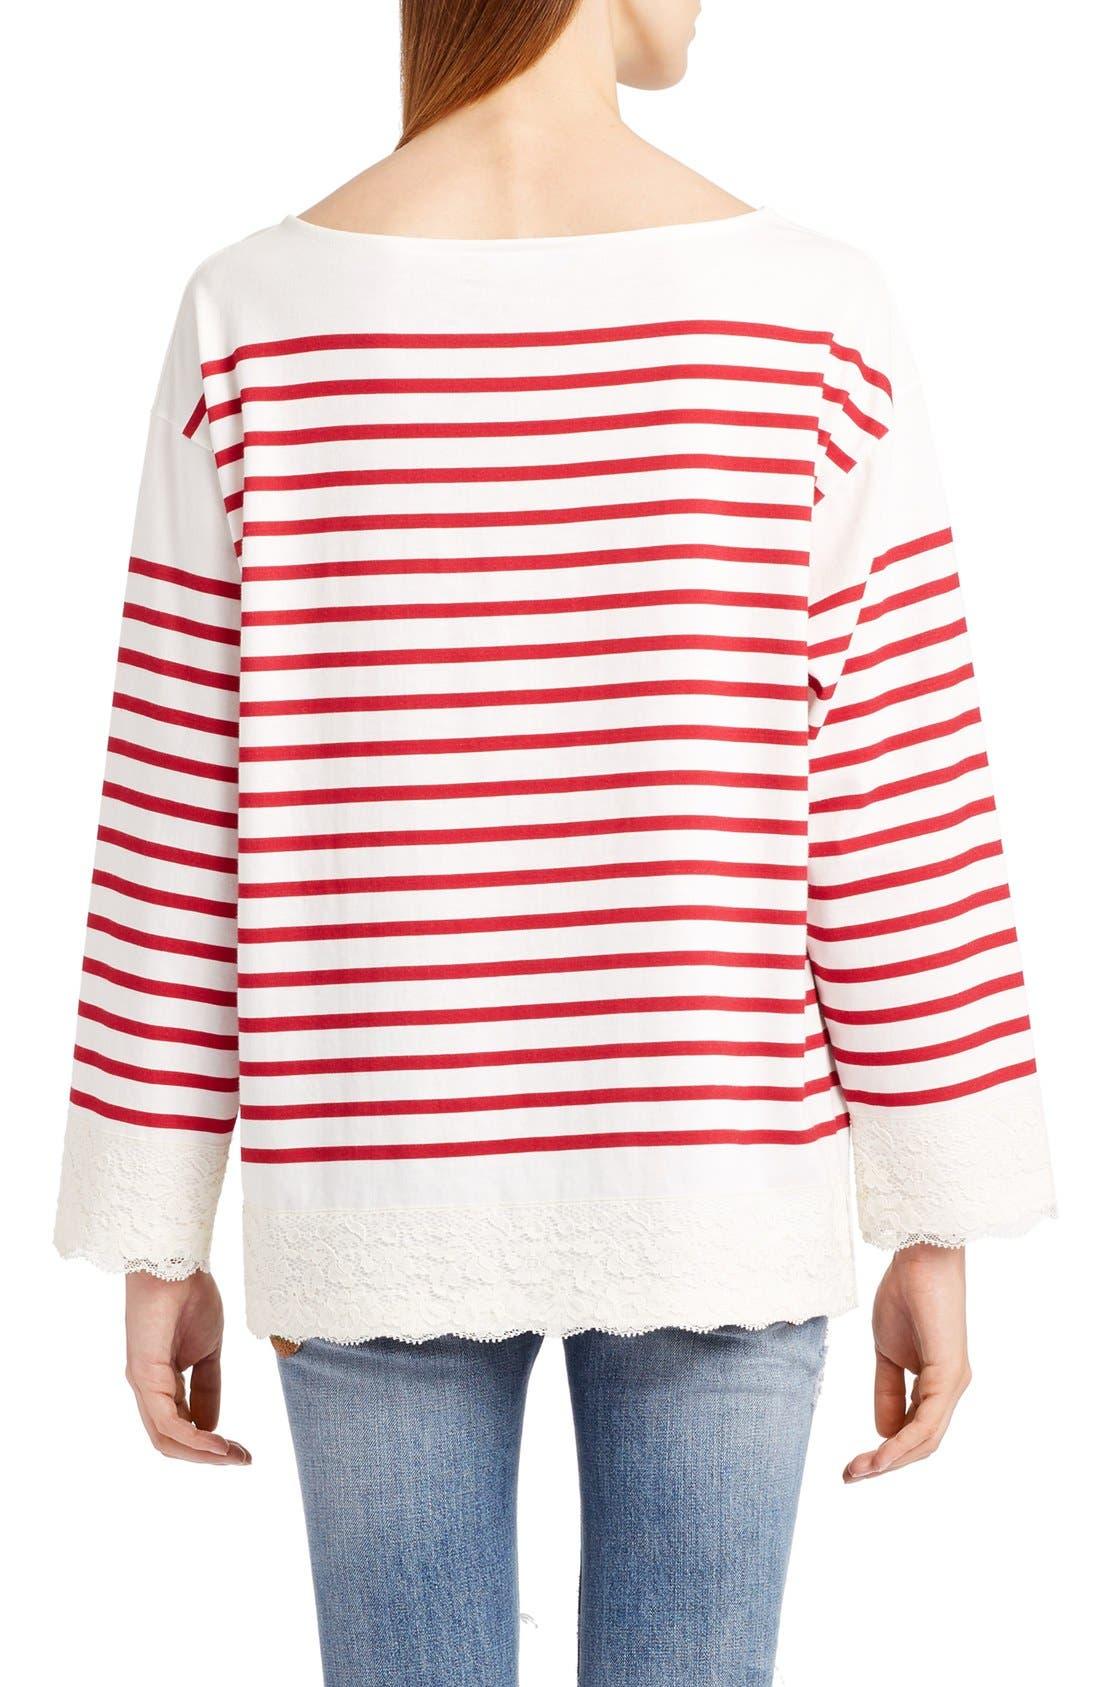 Alternate Image 2  - Dolce&Gabbana Lace Stripe Tee